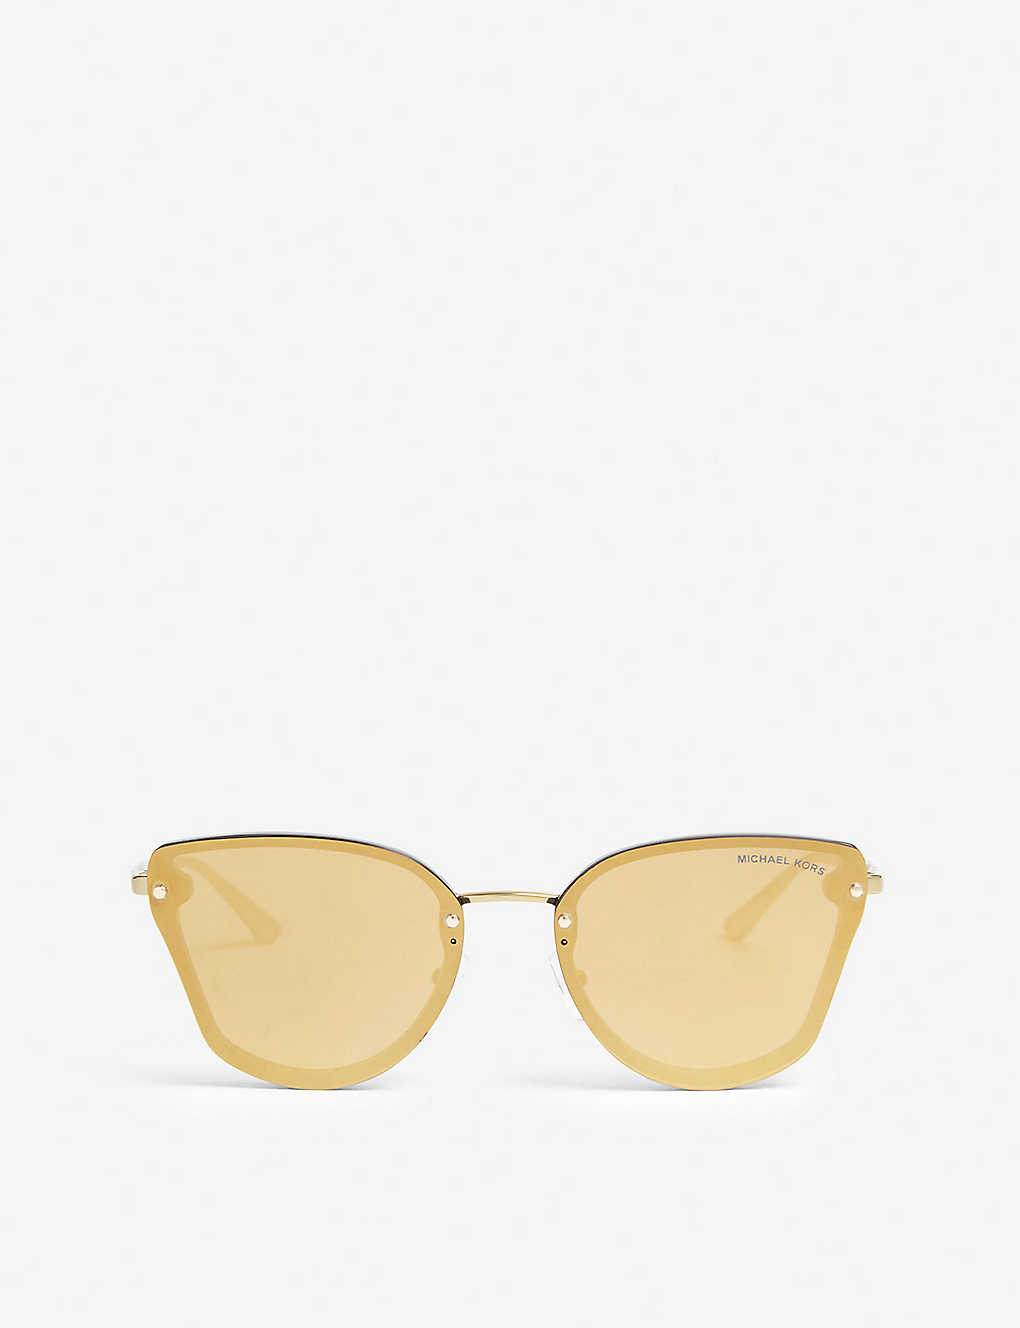 e73addc859f9 MICHAEL KORS - Sanibel butterfly-frame sunglasses | Selfridges.com